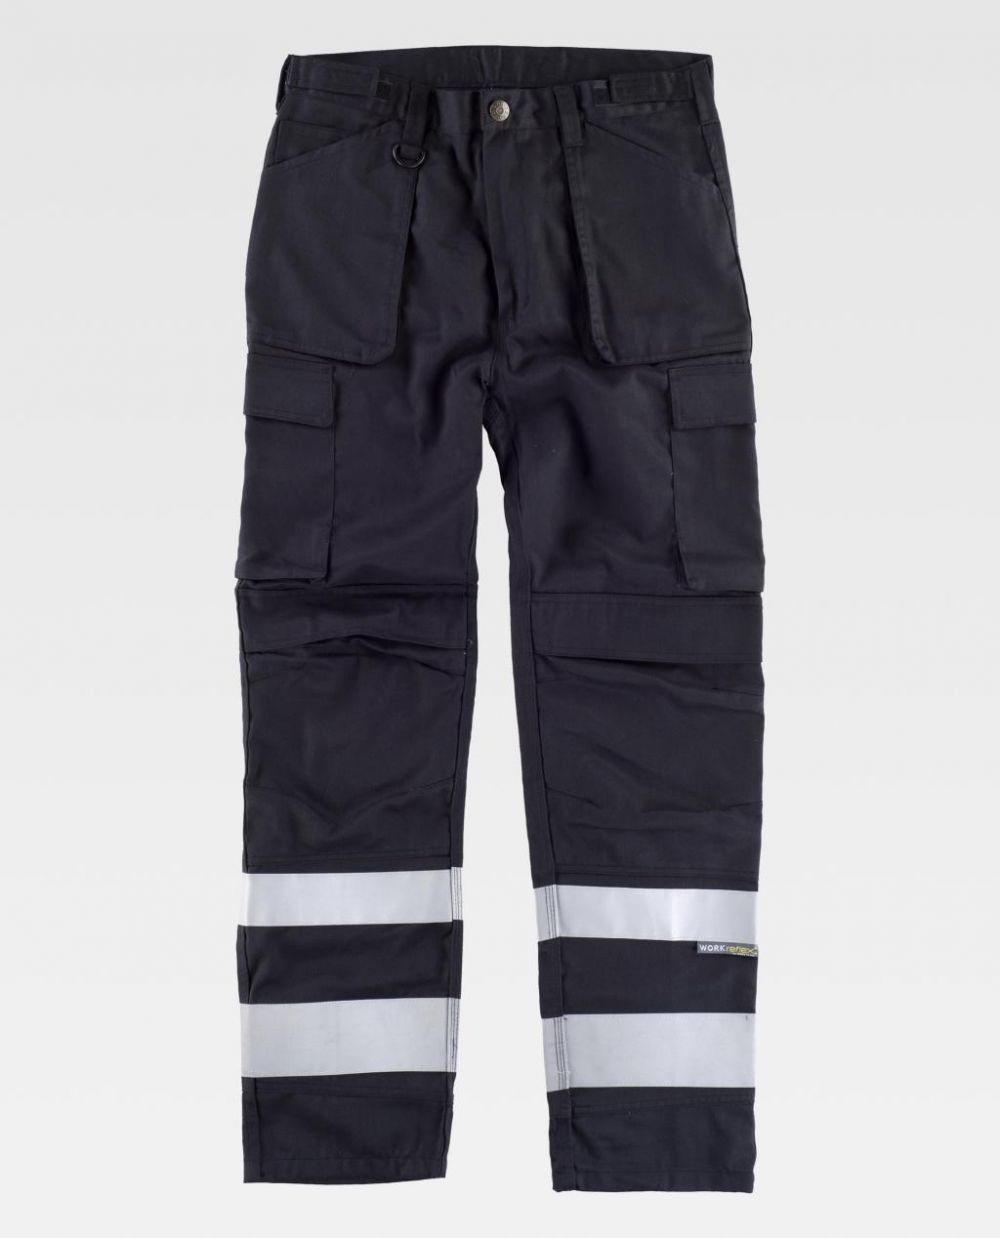 Pantalones reflectantes workteam triple costura de poliéster para personalizar vista 1